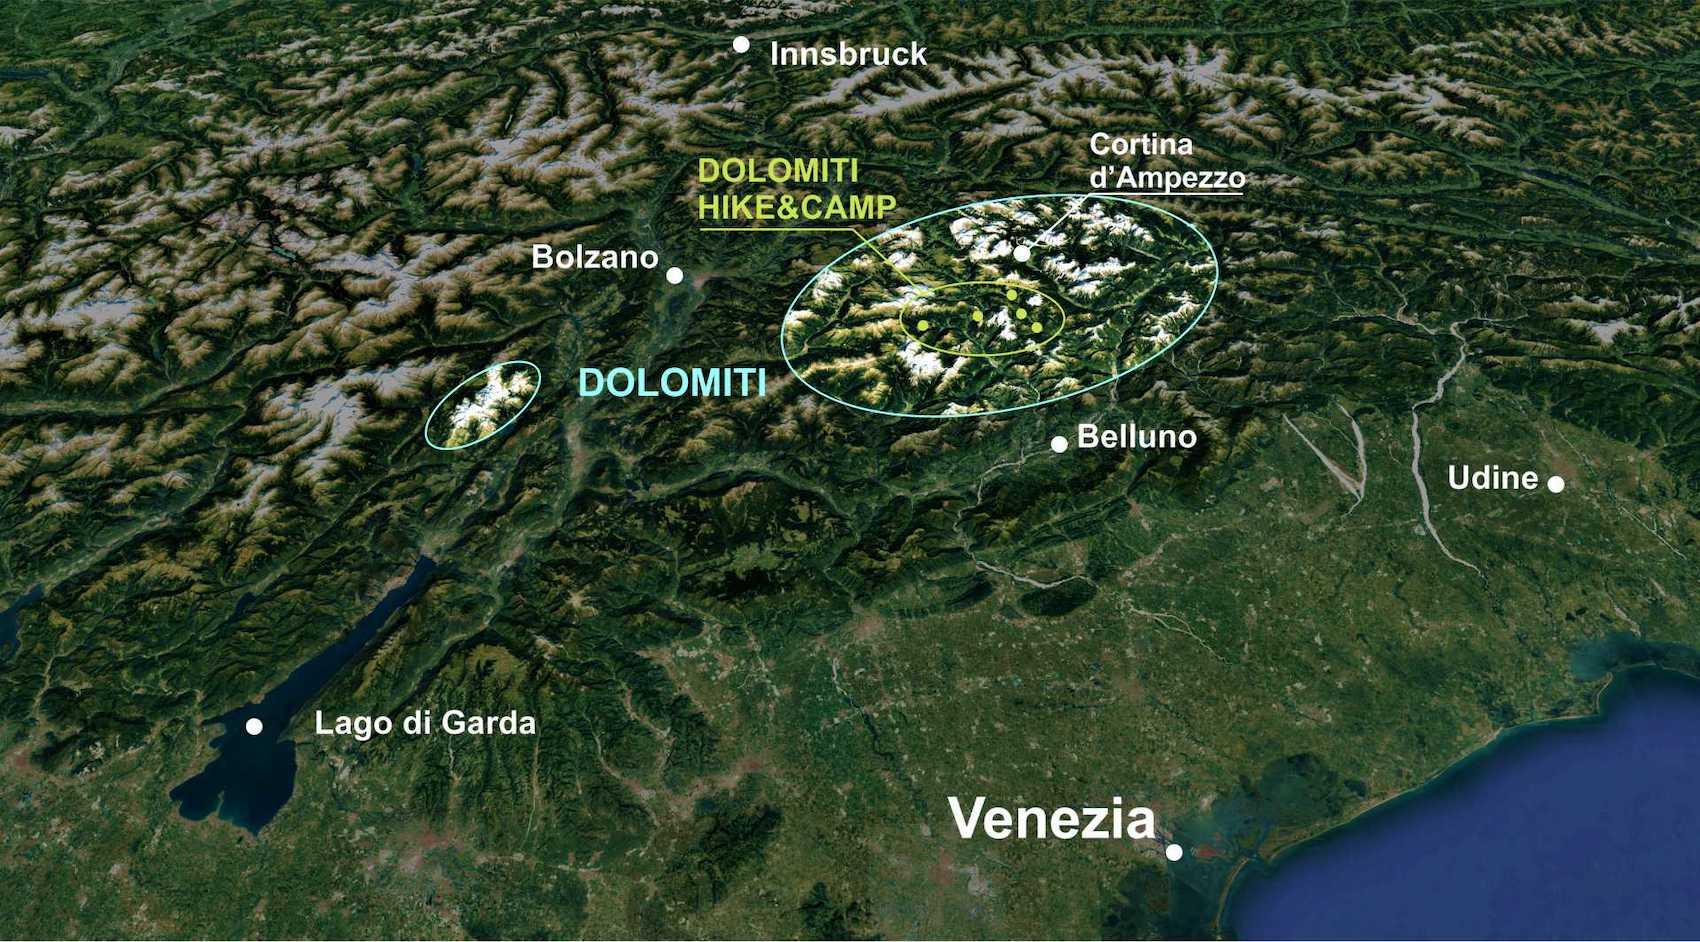 Dolomiti Hike&Camp Map